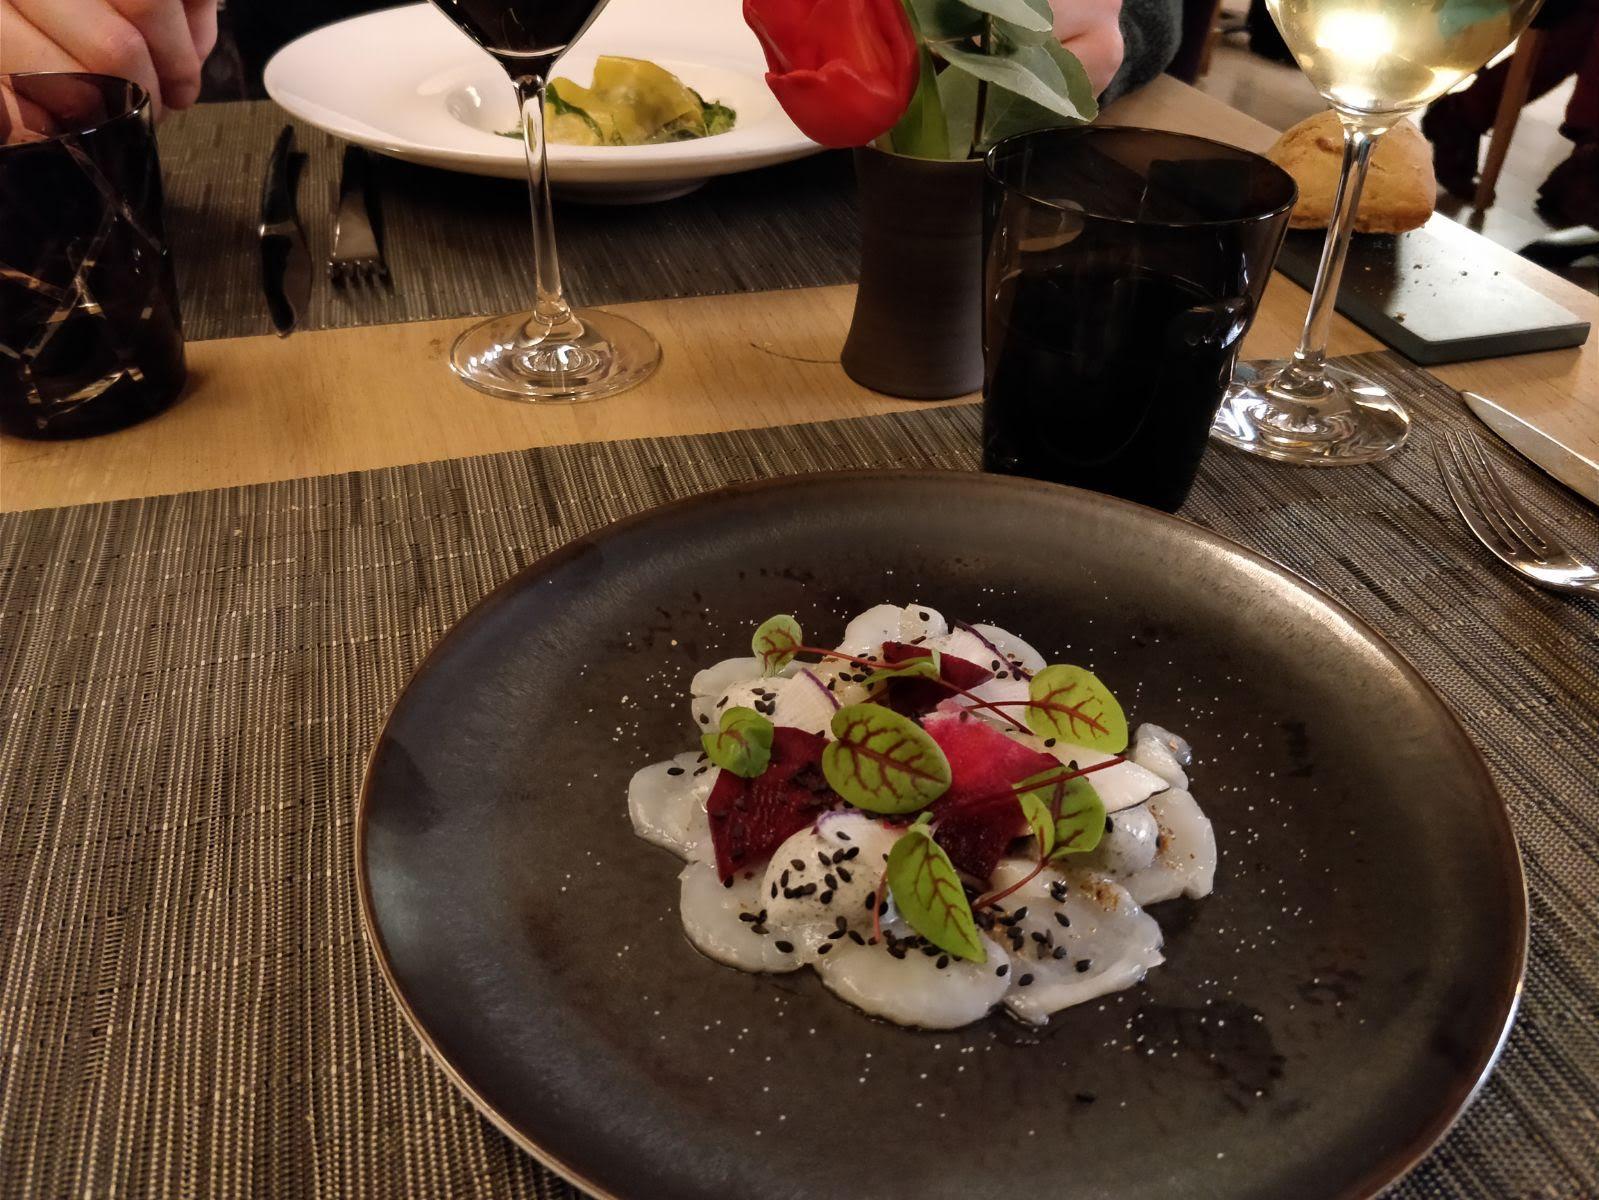 blog-mode-lifestyle-beaute-deco-voyage-cuisine-strasbourg